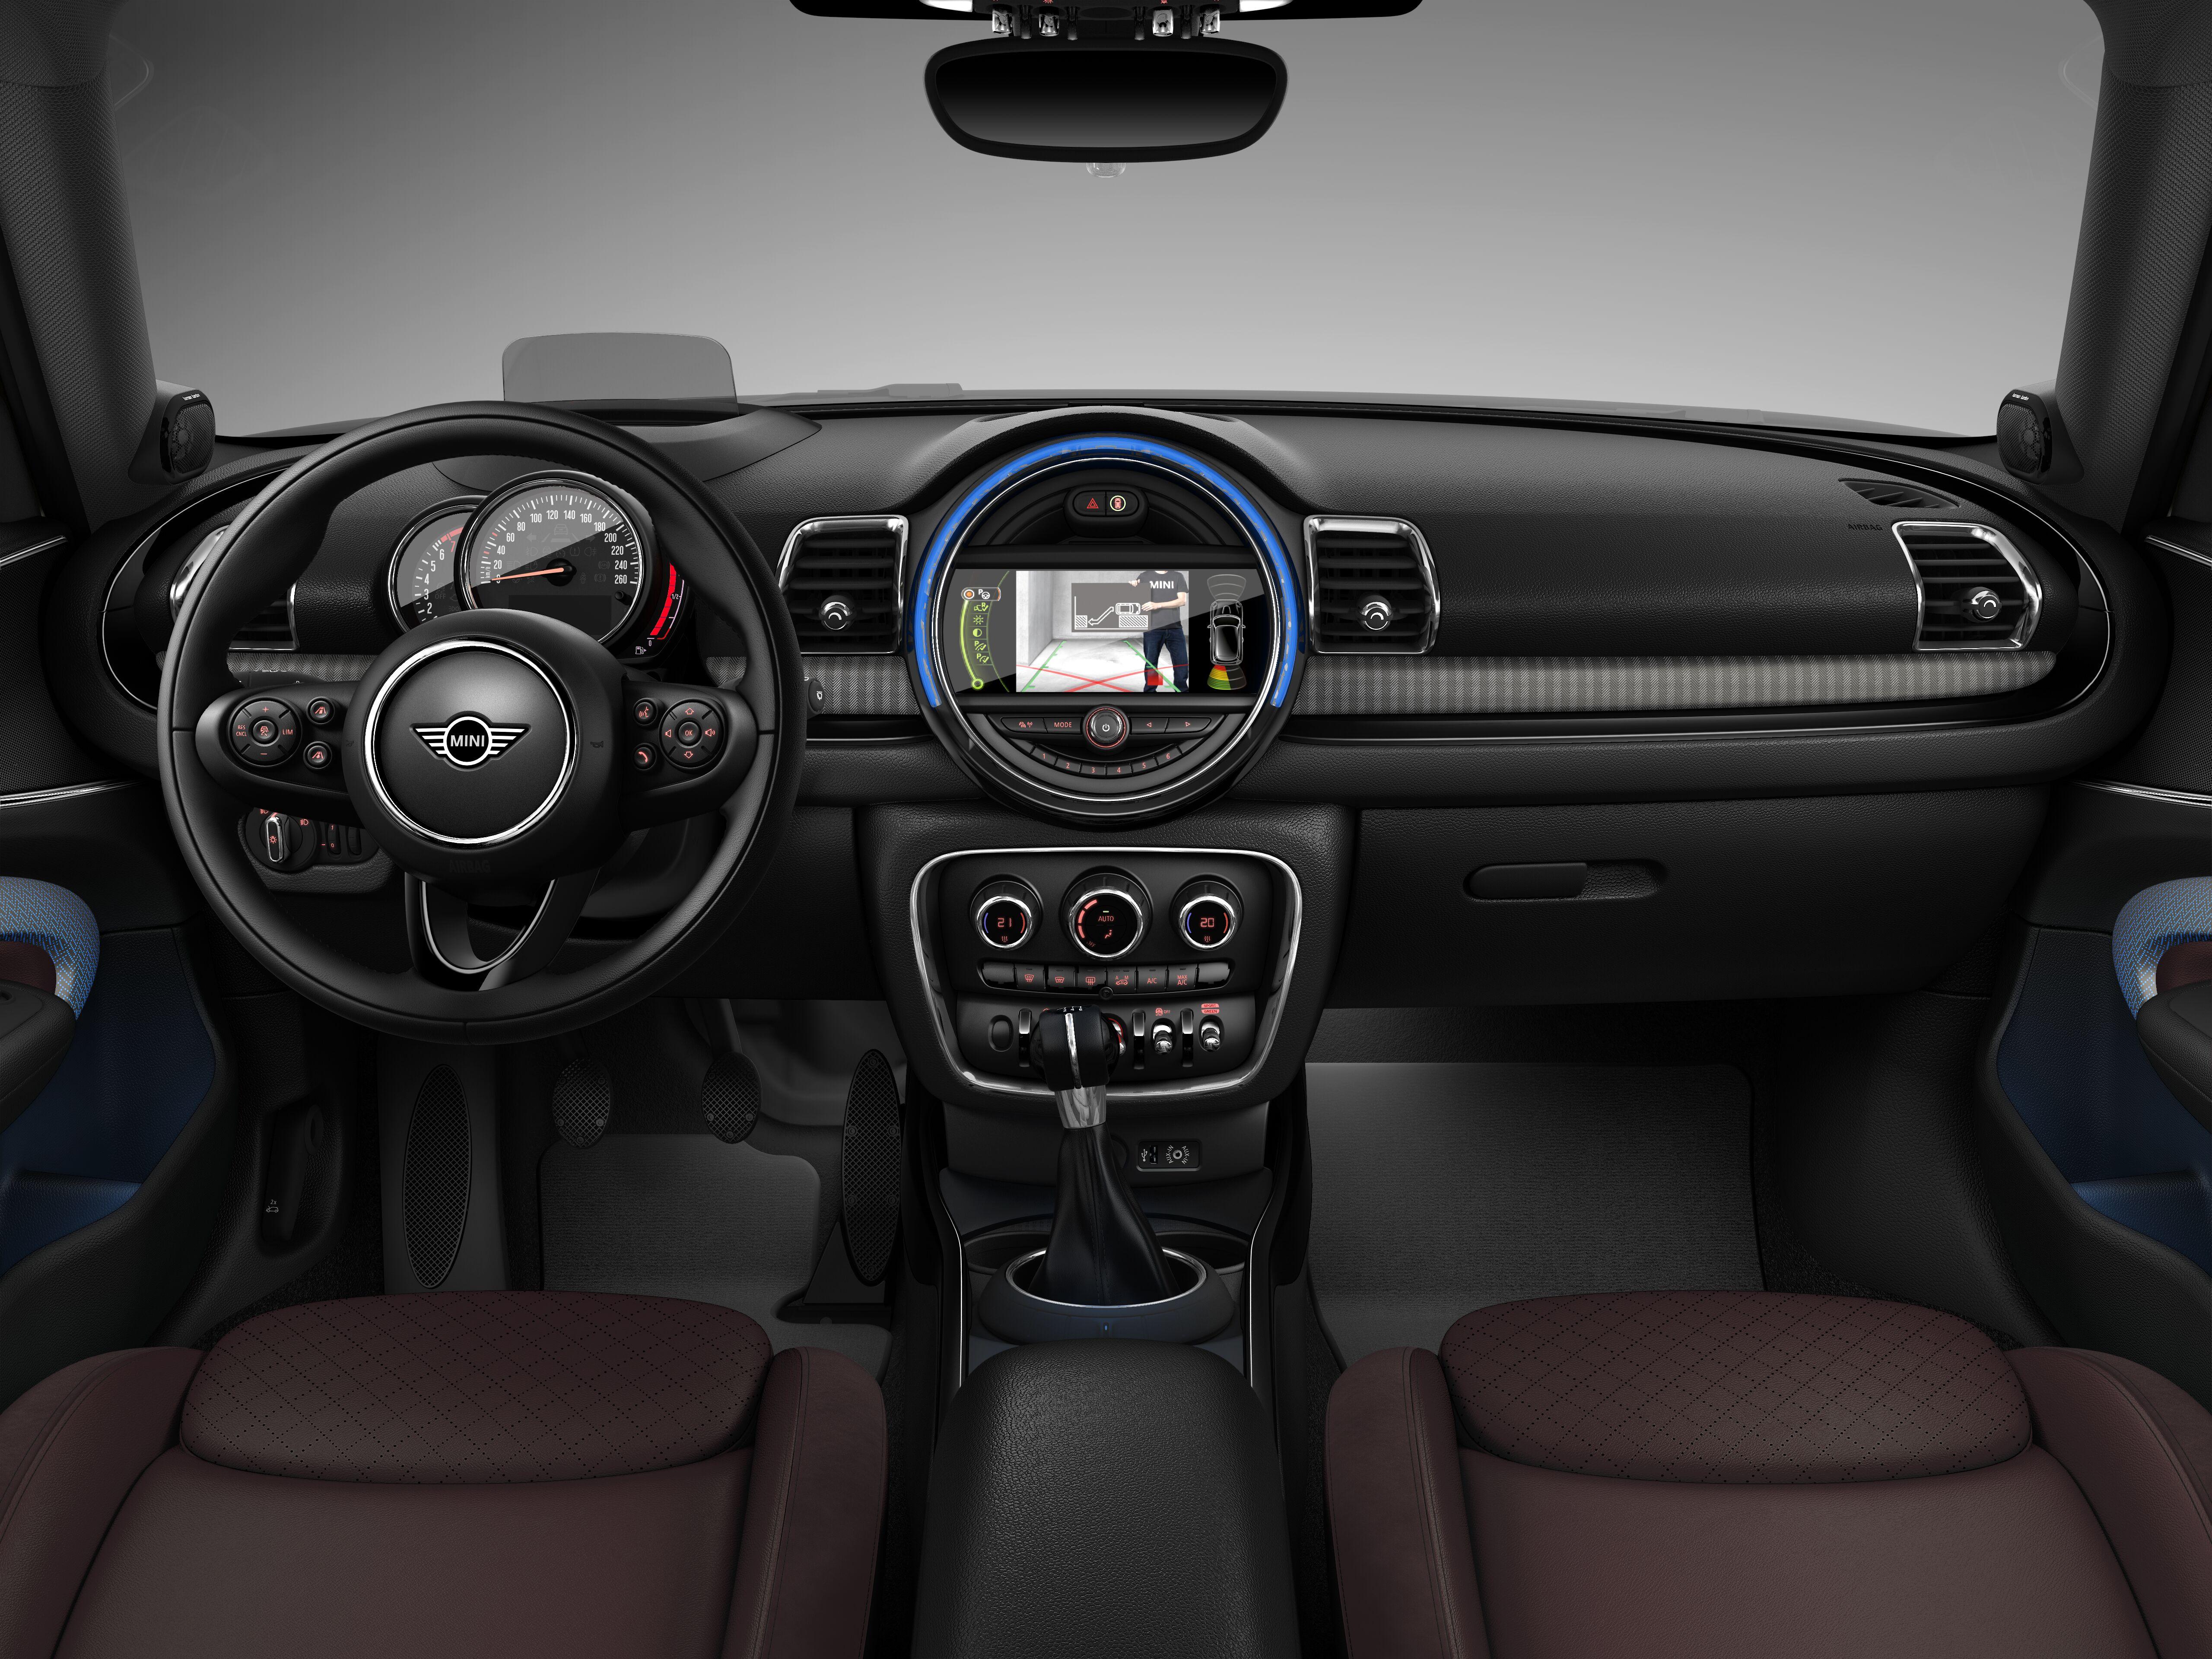 MINI Cooper S Clubman interior; dashboard and steering wheel